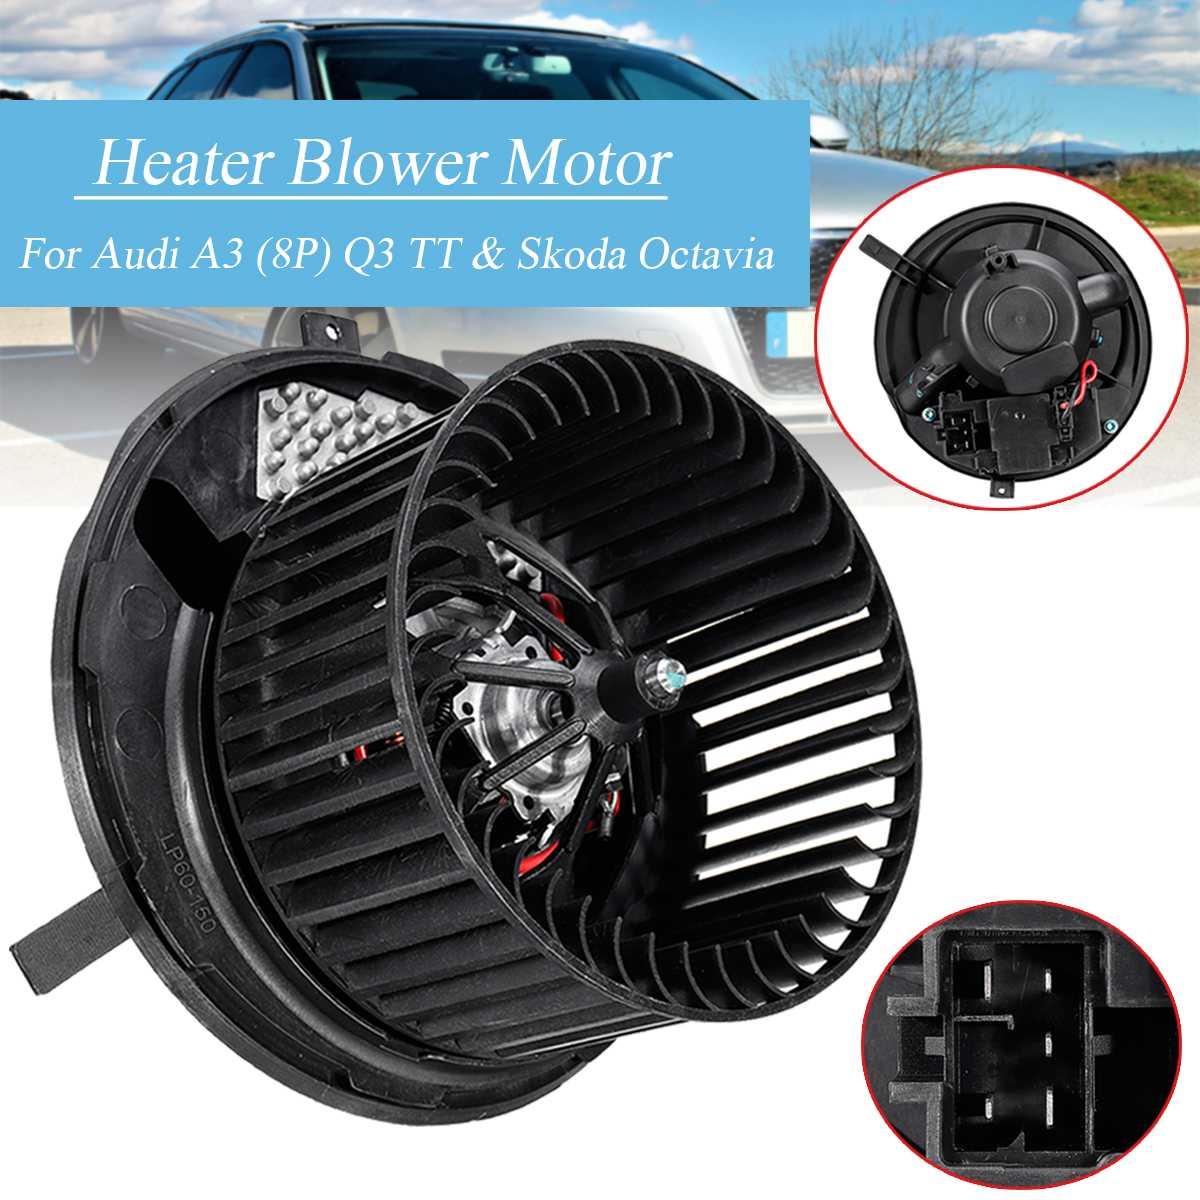 Car Heater Blower Fan Motor 1K2820015G 1K2820015F For Skoda Octavia Superb/Yeti/Audi A3 TT Q3 CC